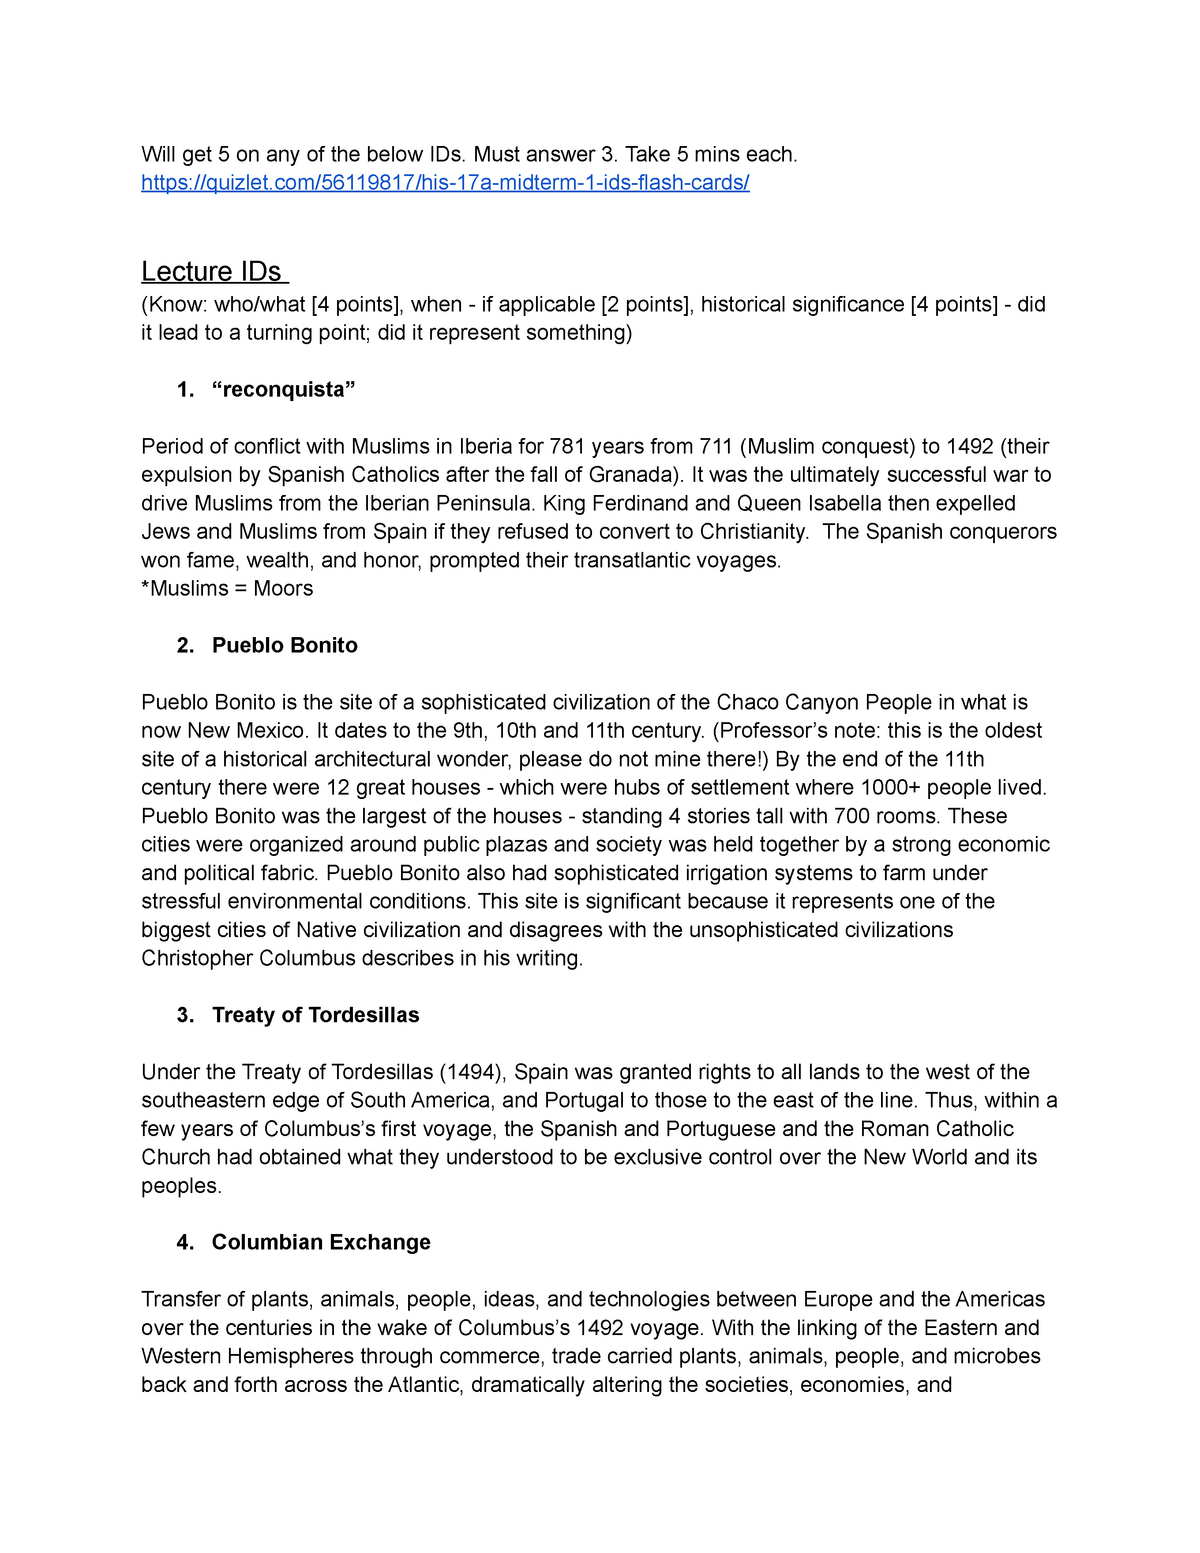 History 17A Midterm Study Guide - HIS 17A - StuDocu